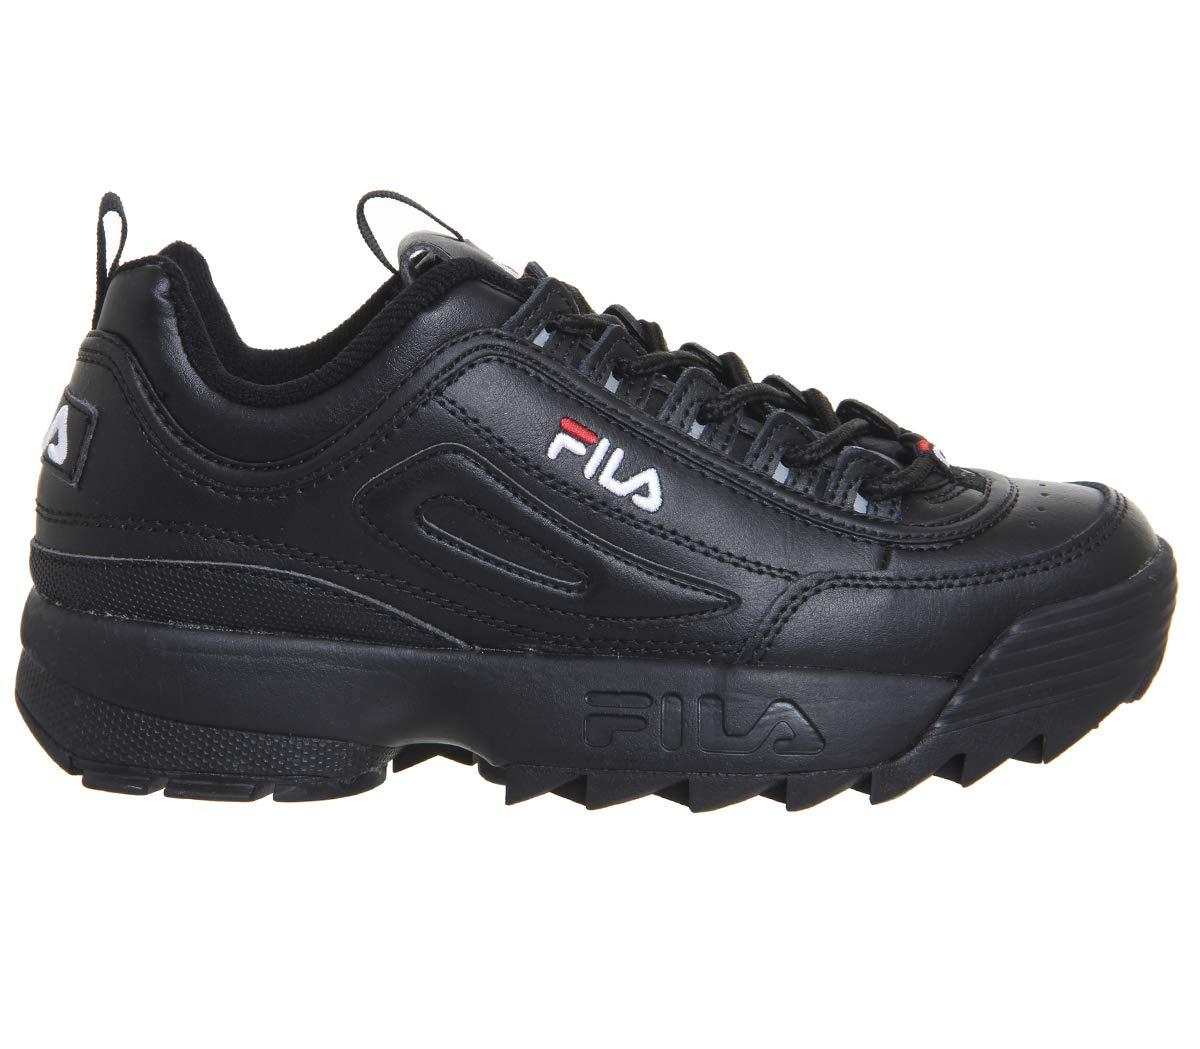 Fila Mujer Blanco Disruptor II Premium Zapatillas product image